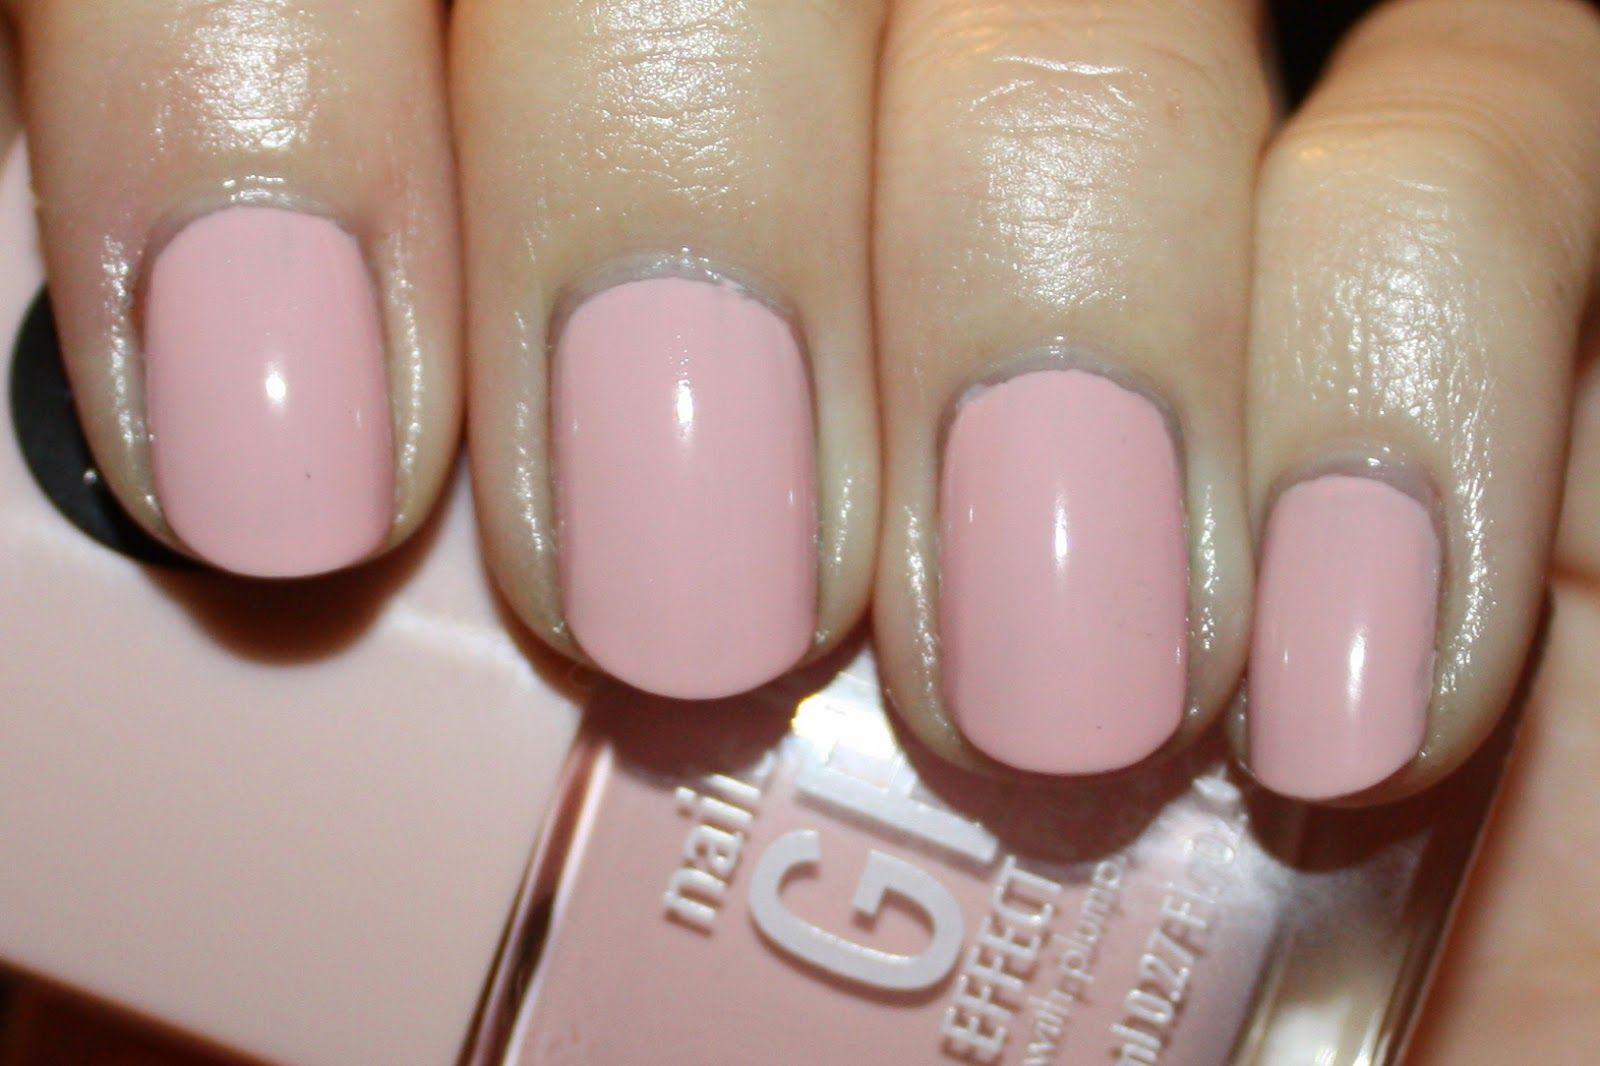 Nails Inc. Gel Effect in Mayfair Lane, light pink | nails inc ...